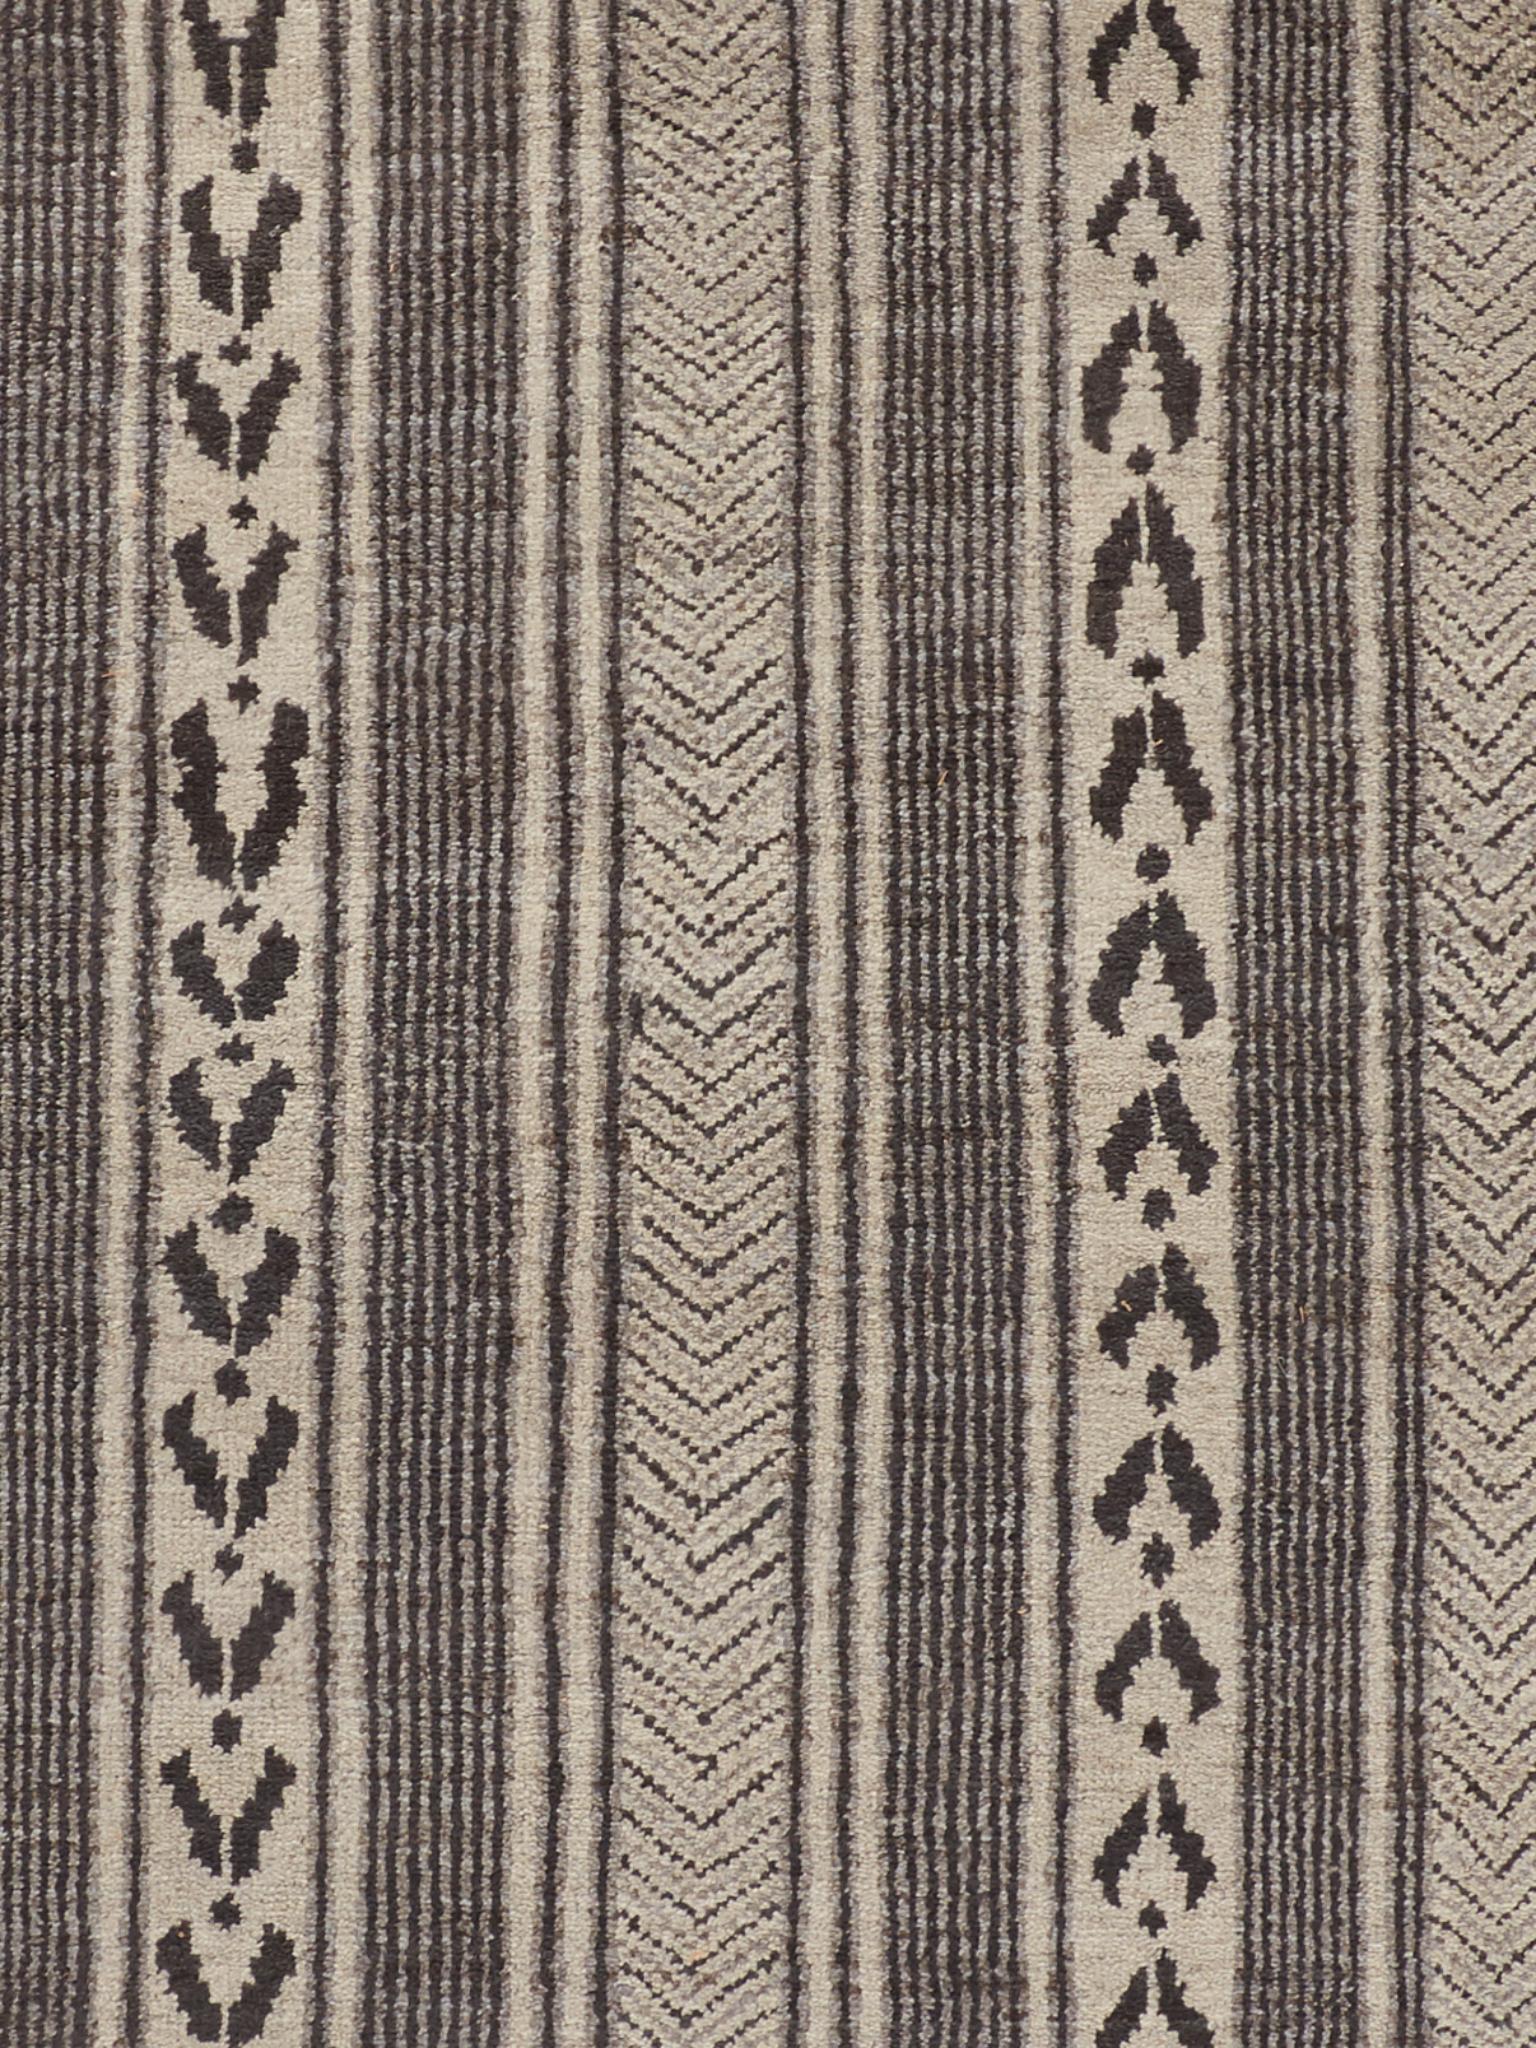 Harrison Design Victoria Hagan Chevron Alt Stripe Rug